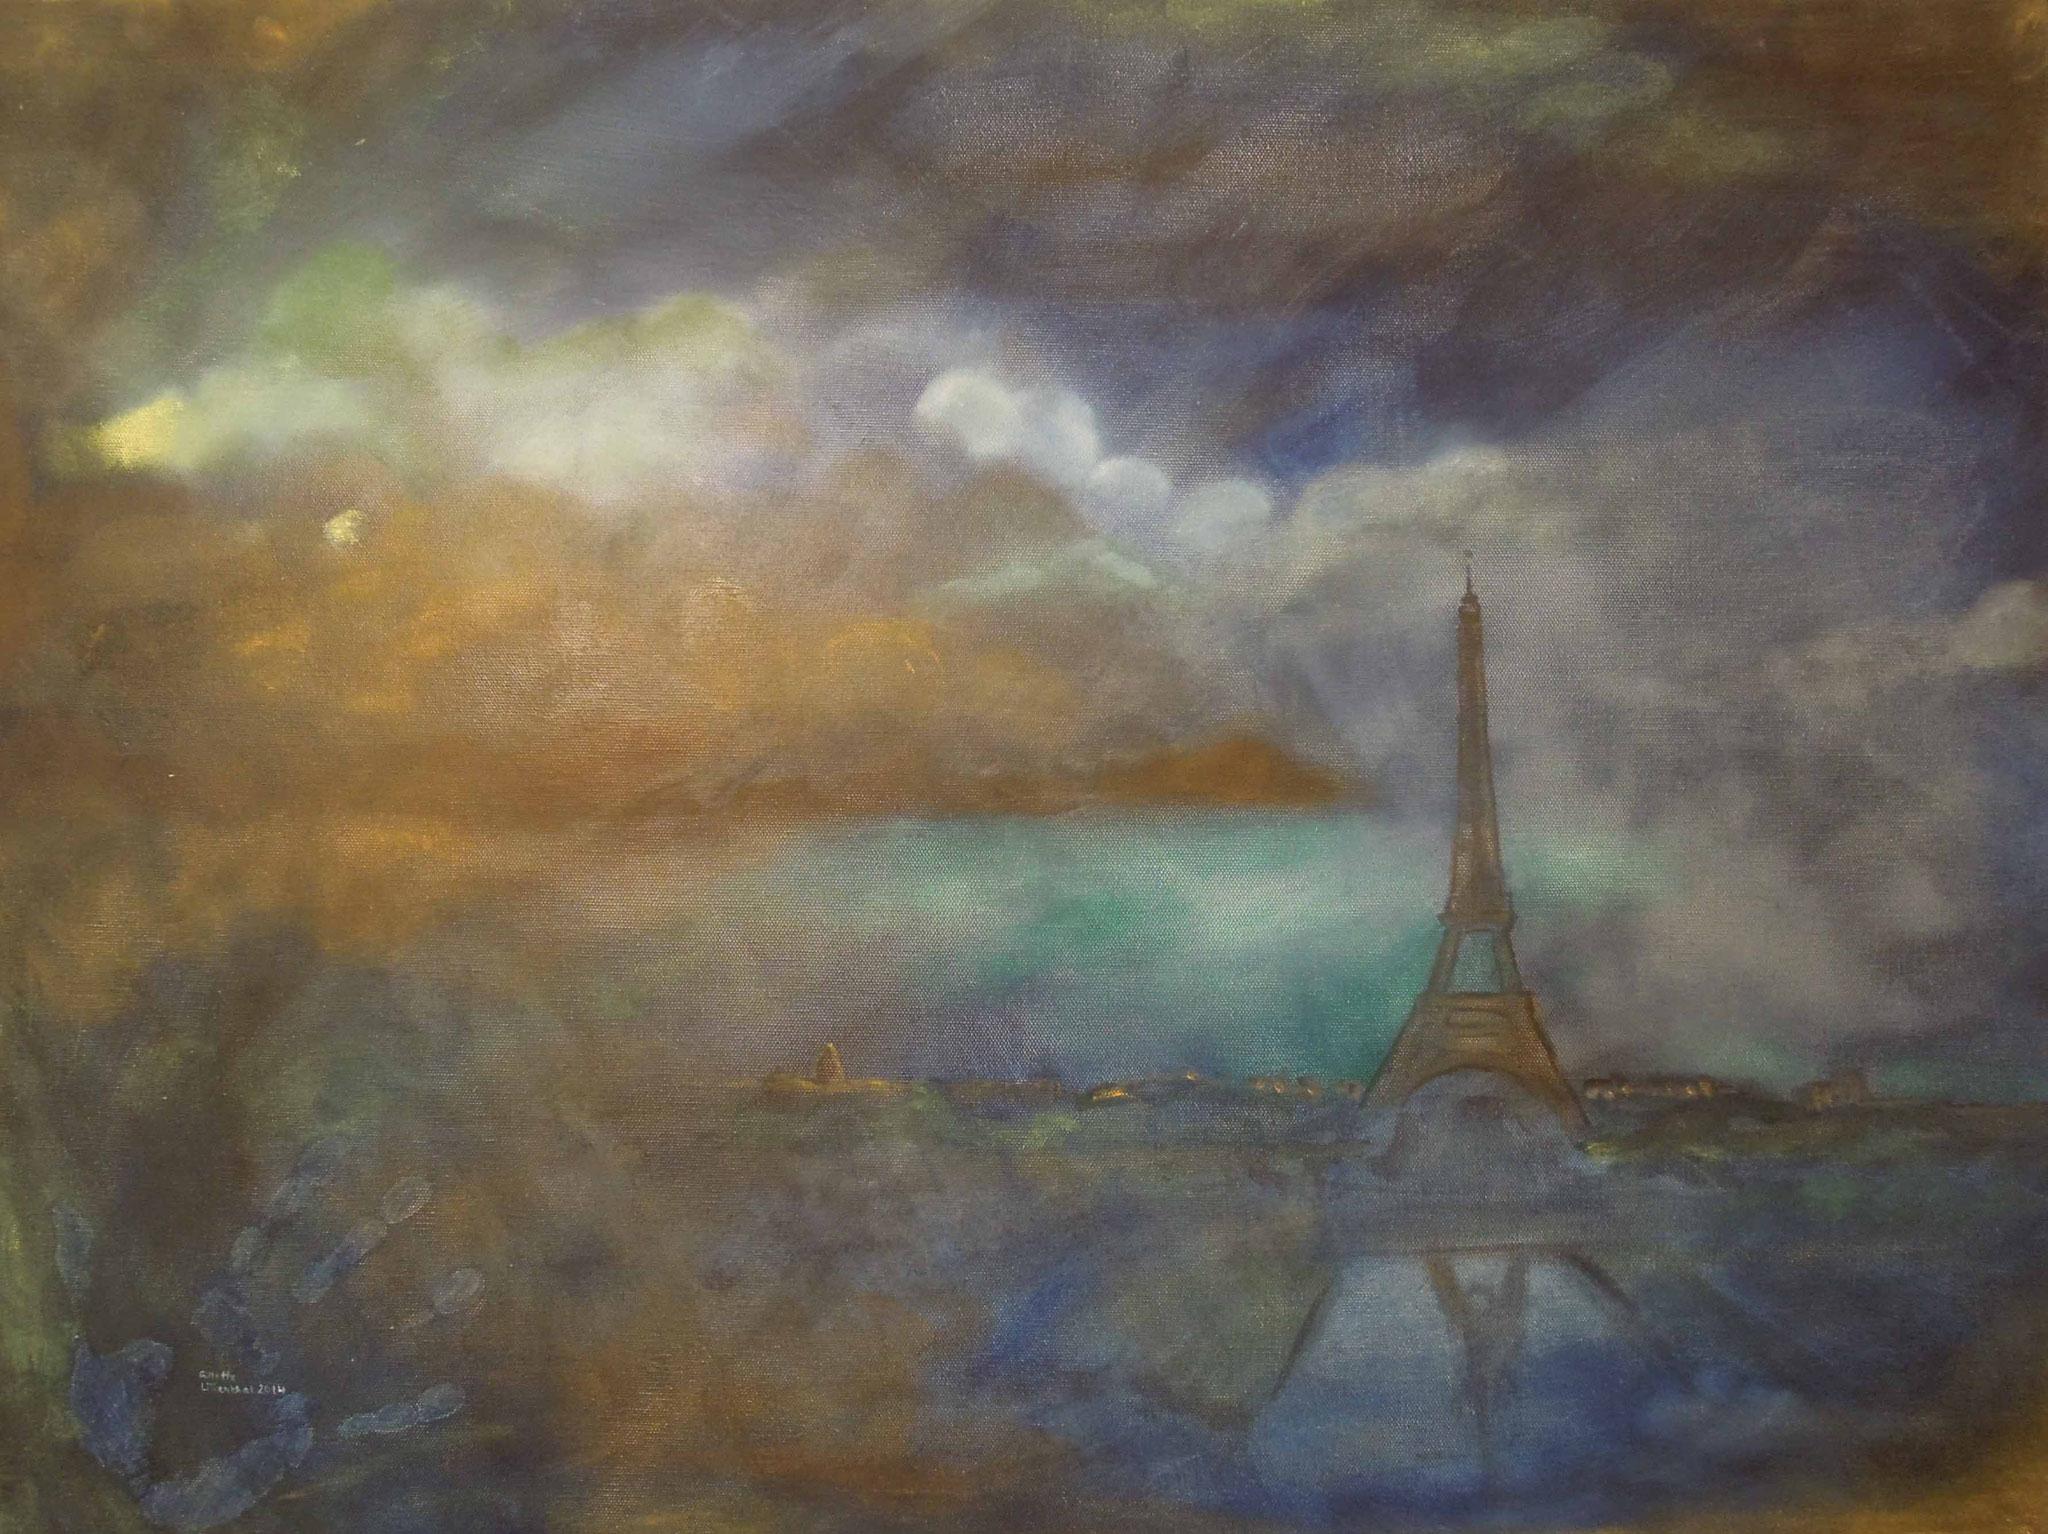 Paris - Öl auf Leinwand 80 x 60 cm